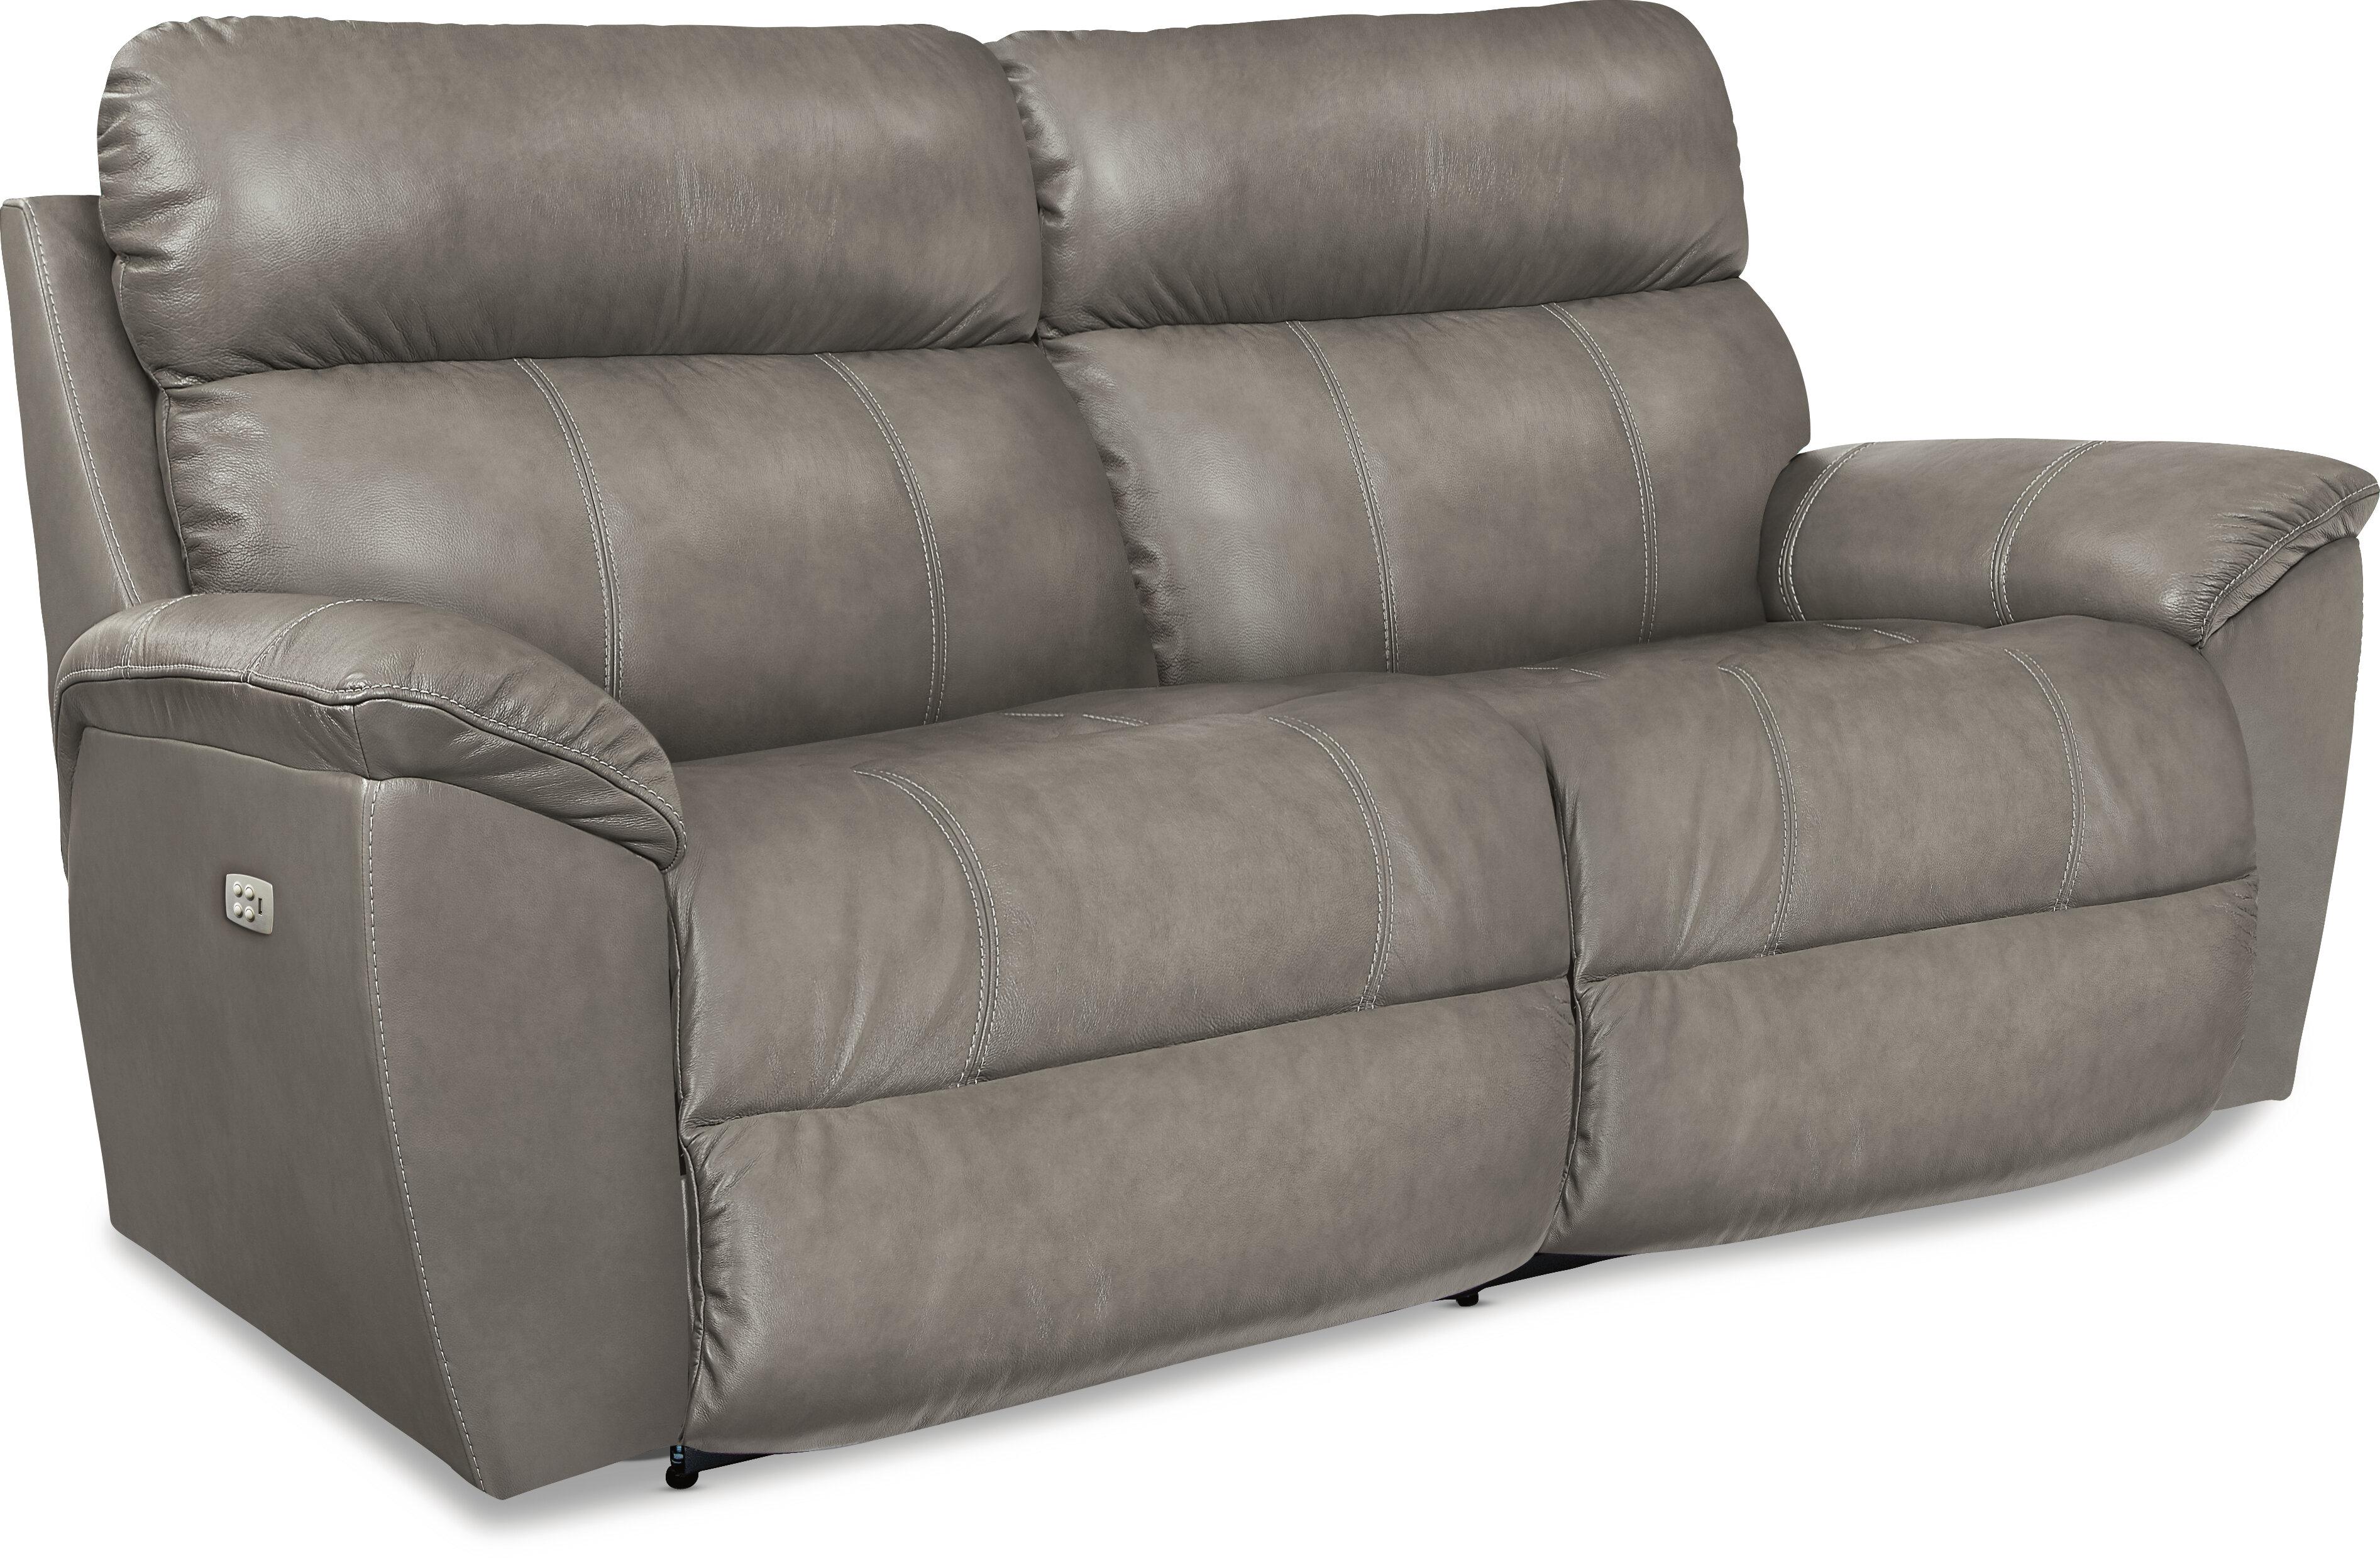 La Z Boy Roman Leather Reclining Sofa